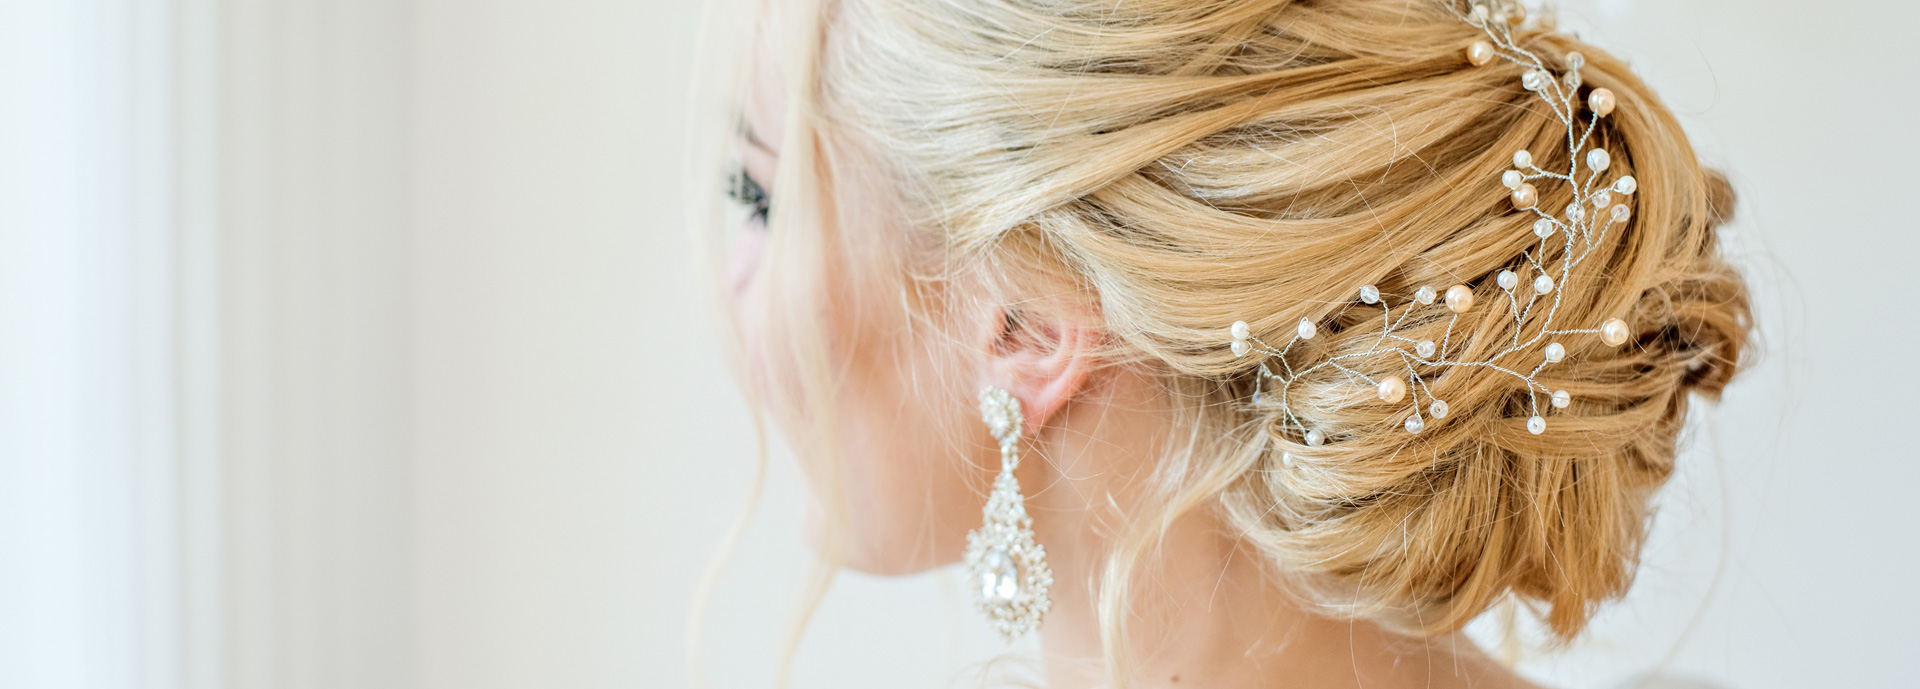 Wedding Hair and Makeup Hampshire